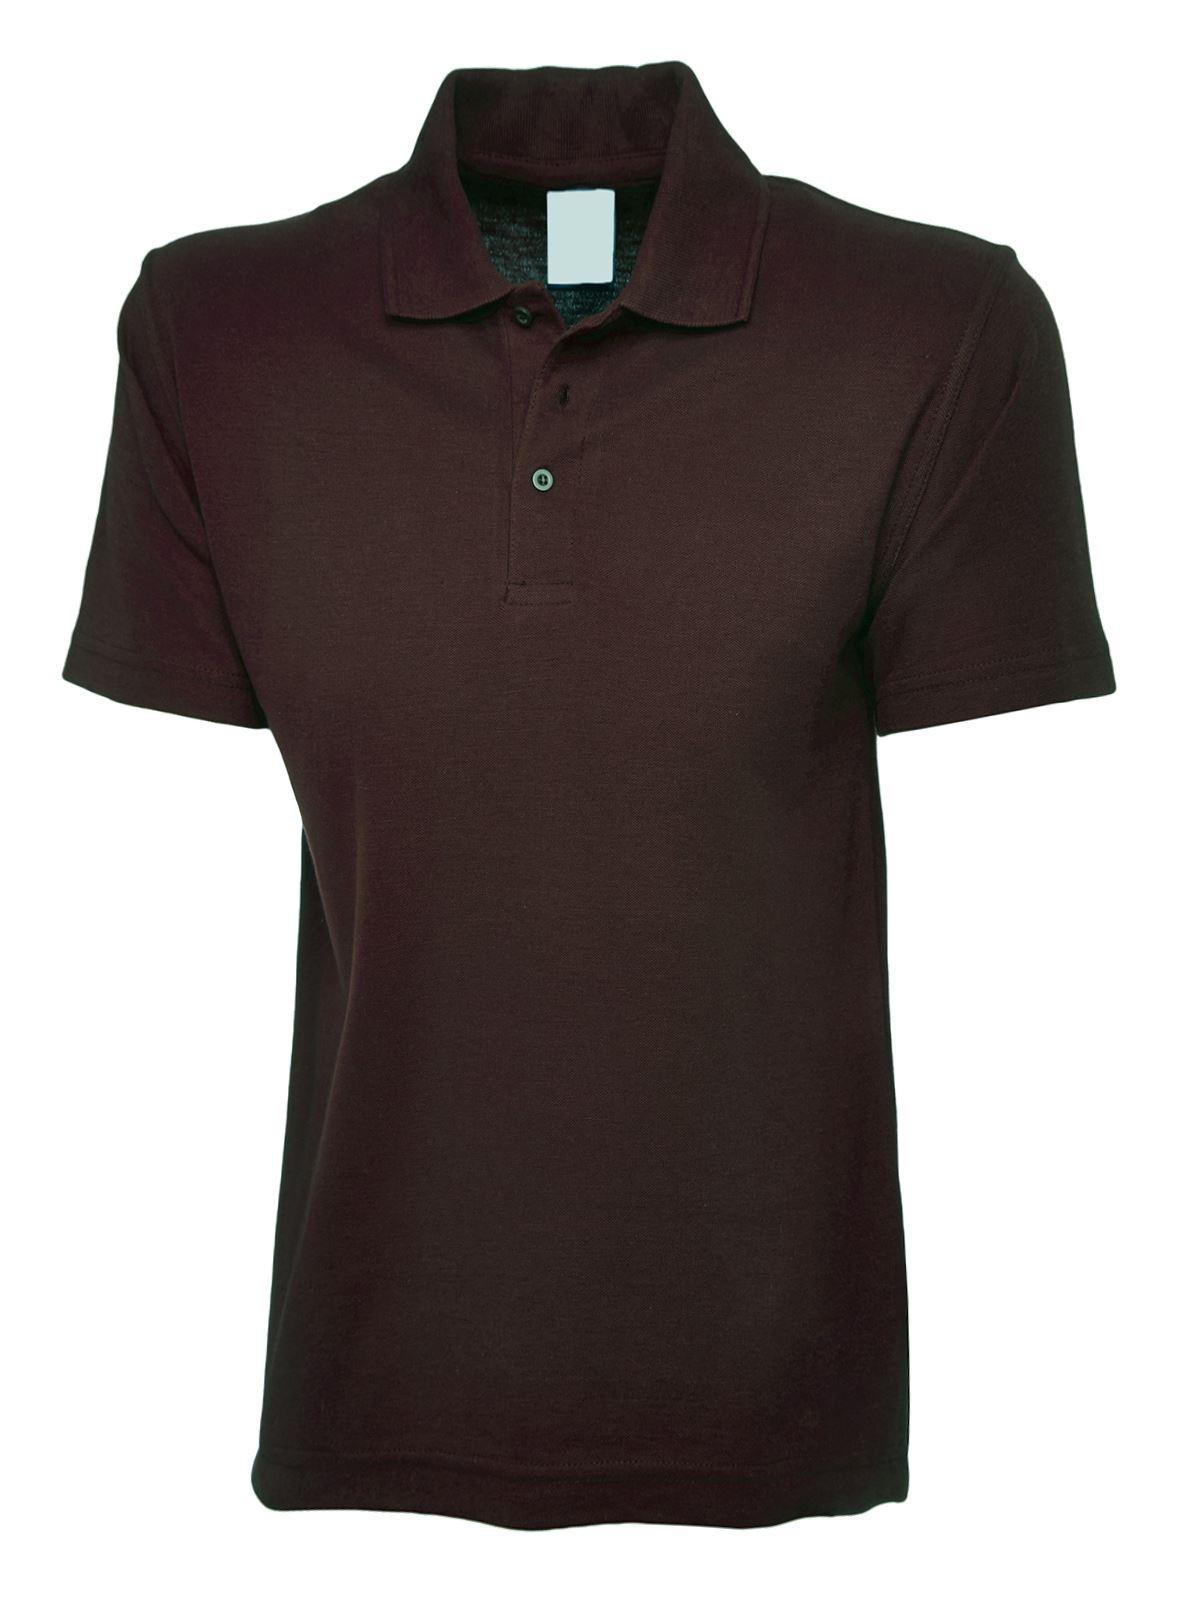 Boys & Girls Polo Shirt Kids Uniform School PE Club Top ...